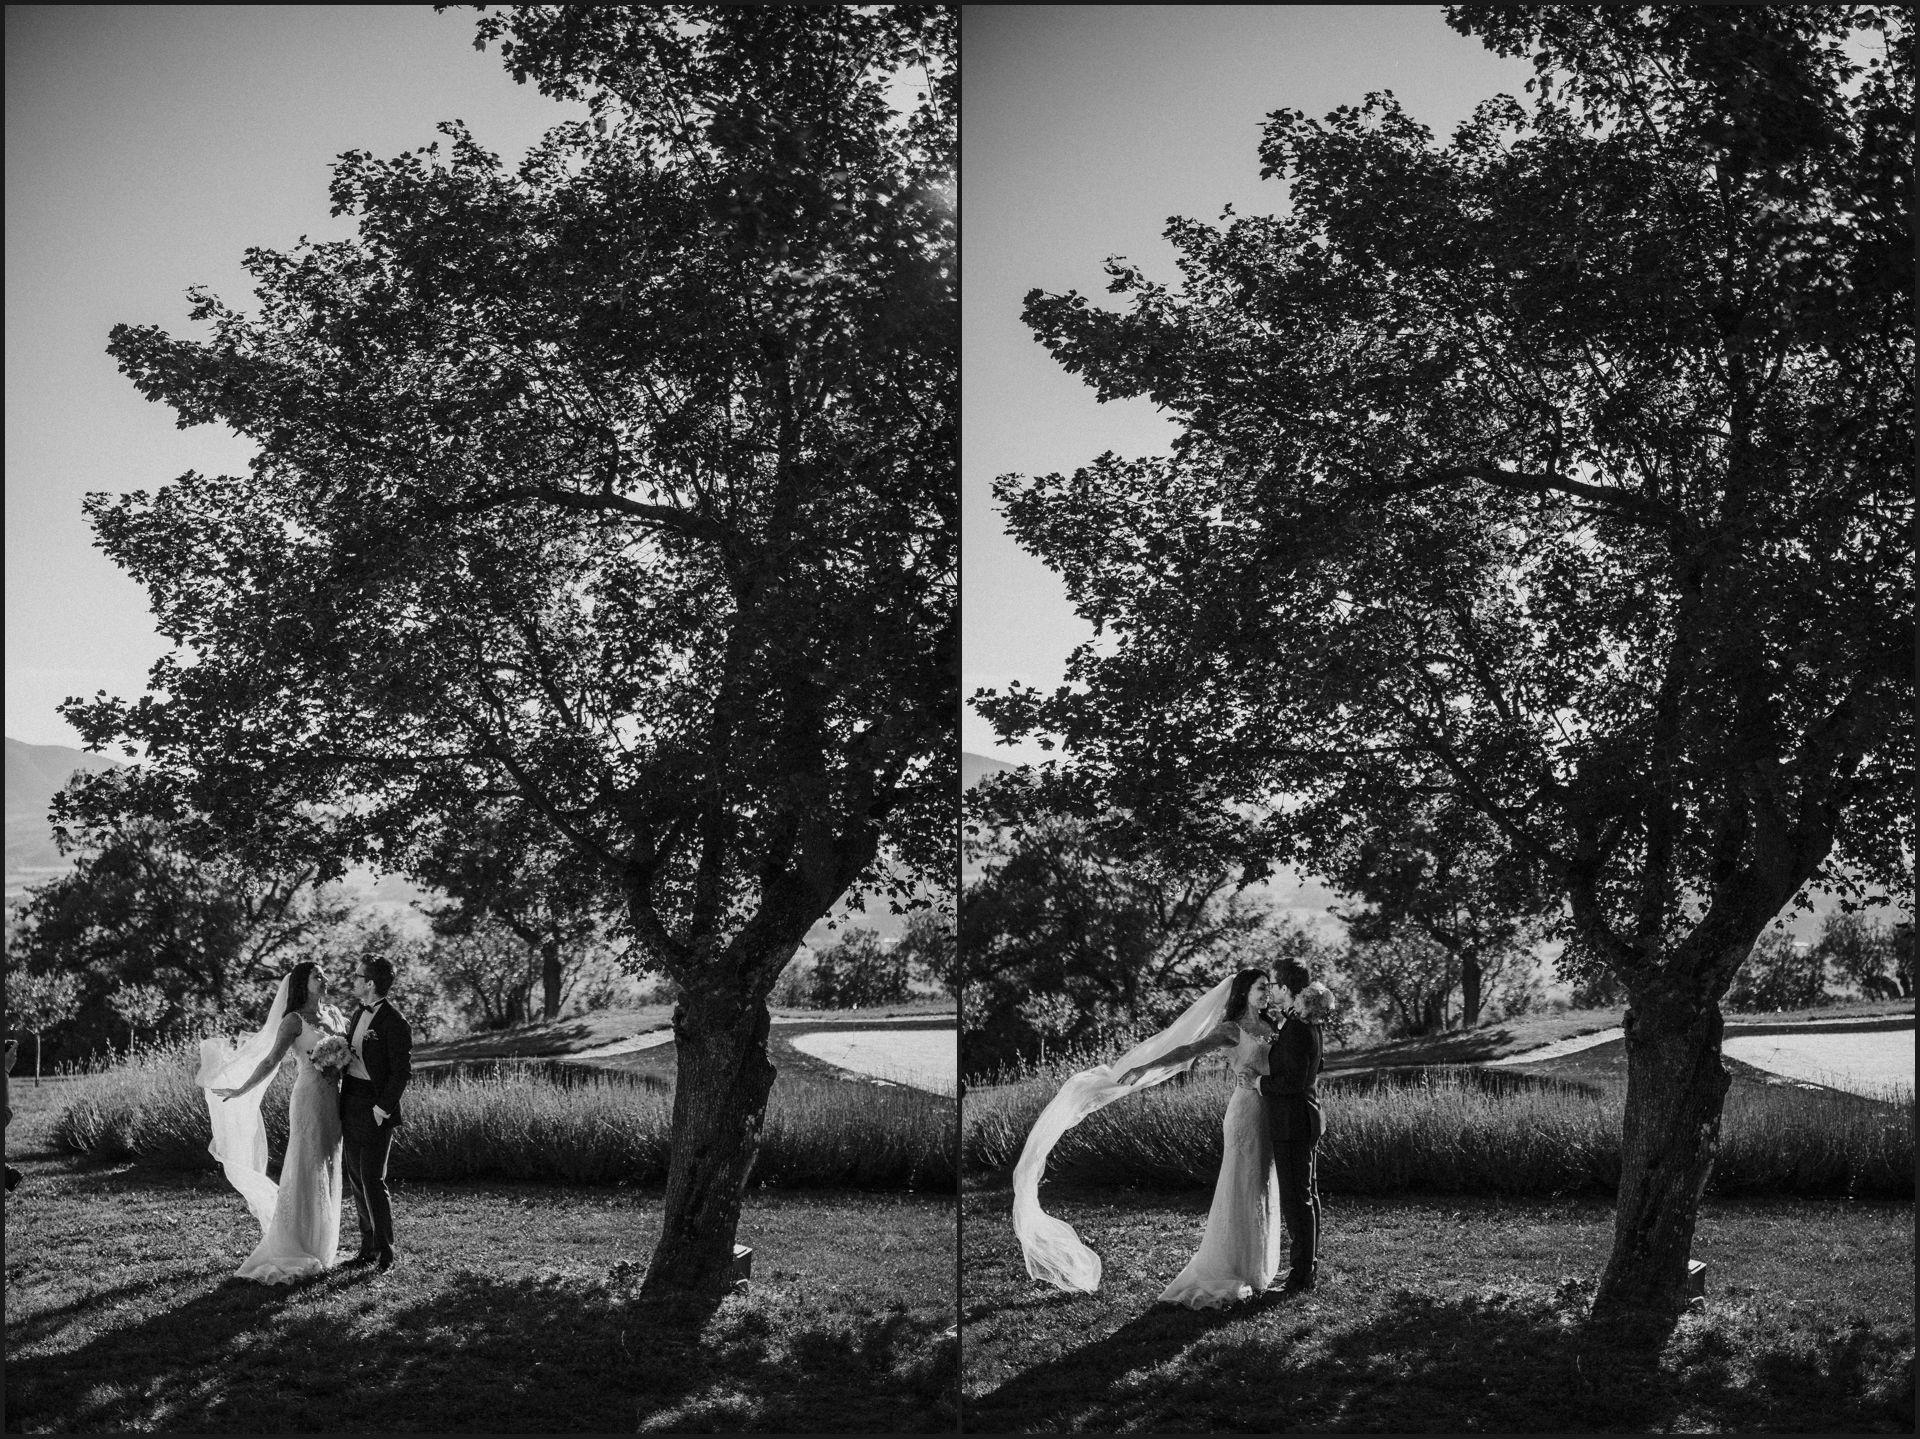 black and white, wedding, umbria, nikis resort, bride, groom, veil, tree, rustic